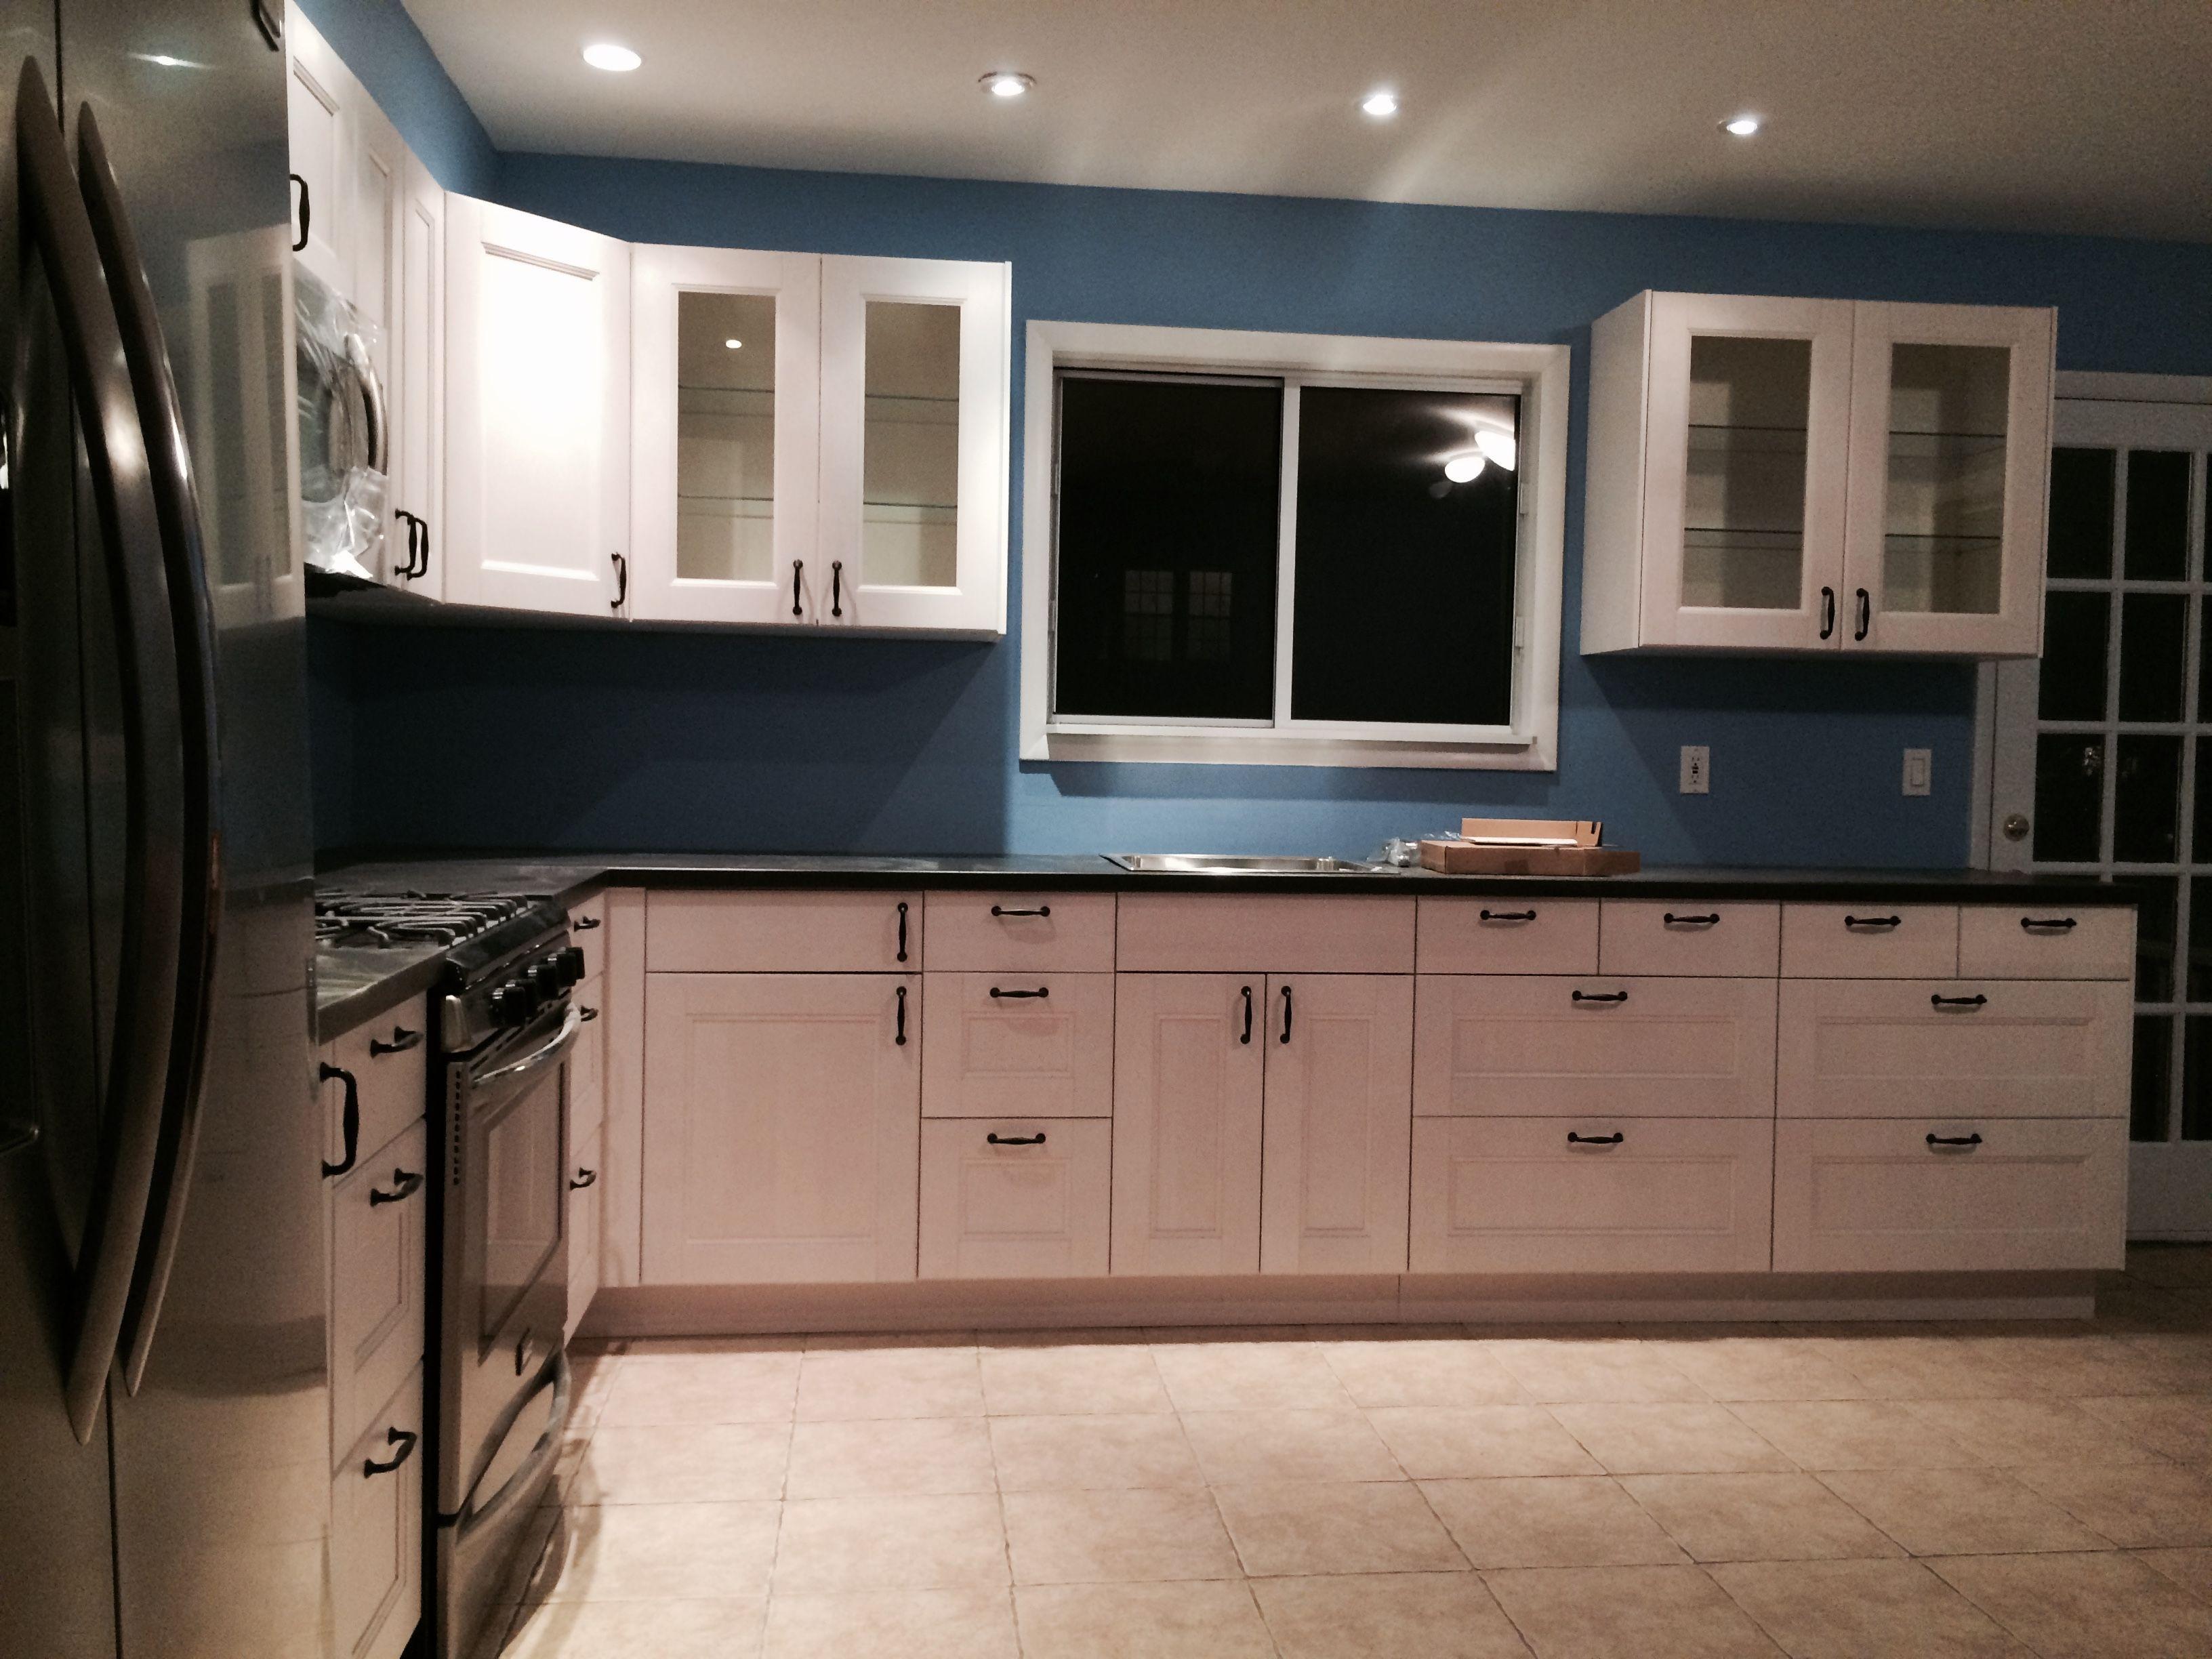 Staten Island Nj Ikea Kitchen Cabinet Install Kitchen Cabinets Kitchen Cabinet Design Kitchen Cabinets Models